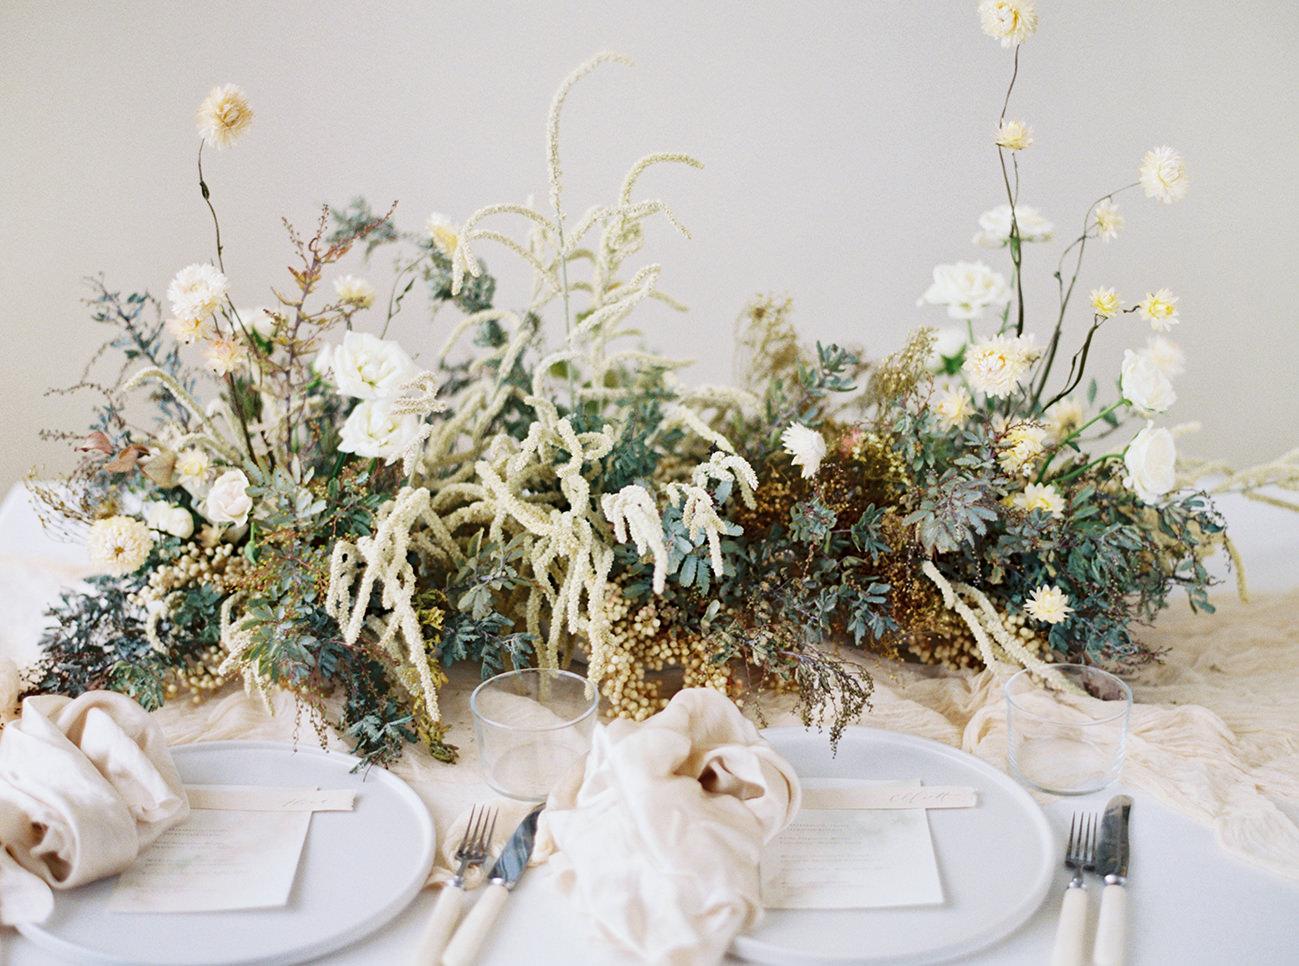 Bridal Inspiration, Wedding Bouquet, Hääkuvaus, Film Wedding Photographer, Table Setting Inspiration, Stationery, Dried Flowers, www.nordandmae.com, www.susannanordvall (34).jpg